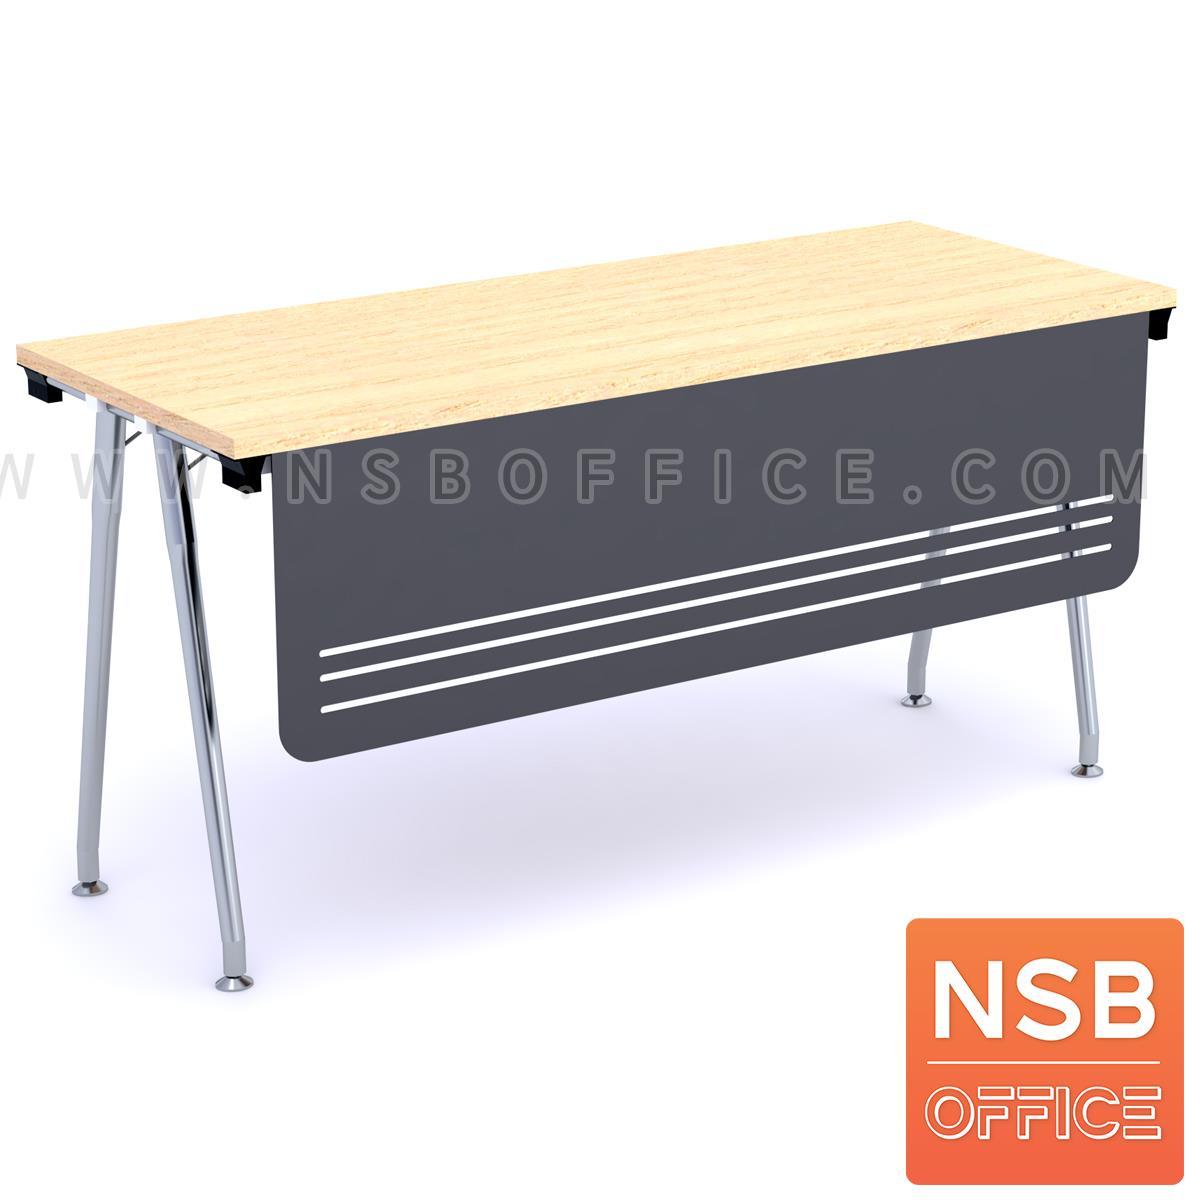 A07A052:โต๊ะประชุมพับเก็บได้ รุ่น  Berline (เบอไลน์) ขนาด 150W ,180W*60D ,75D cm.  พร้อมบังโป๊เหล็ก ขาเหล็ก